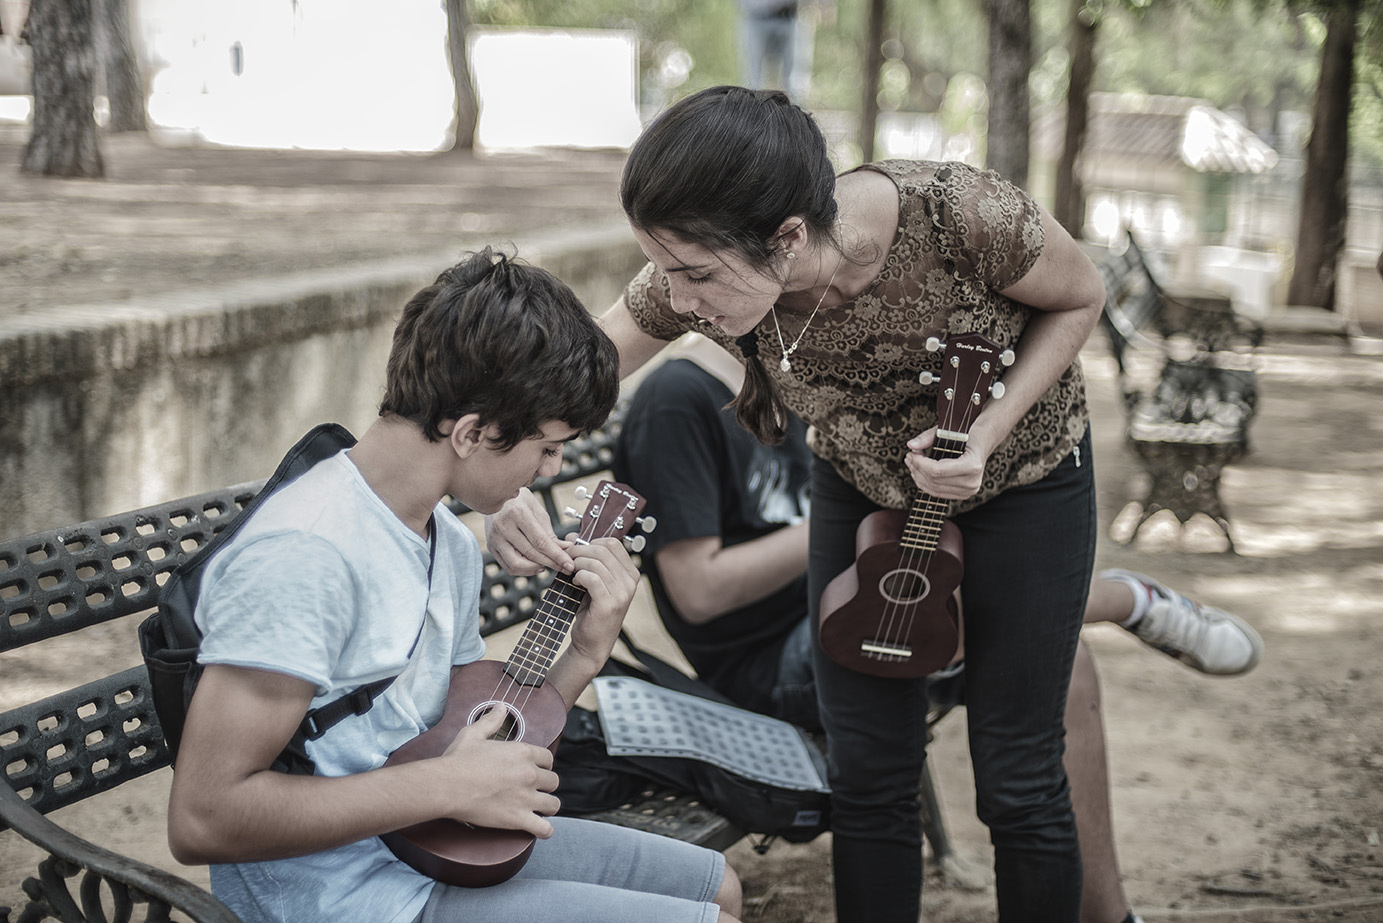 Colegio Aljarafe música con Ukelele